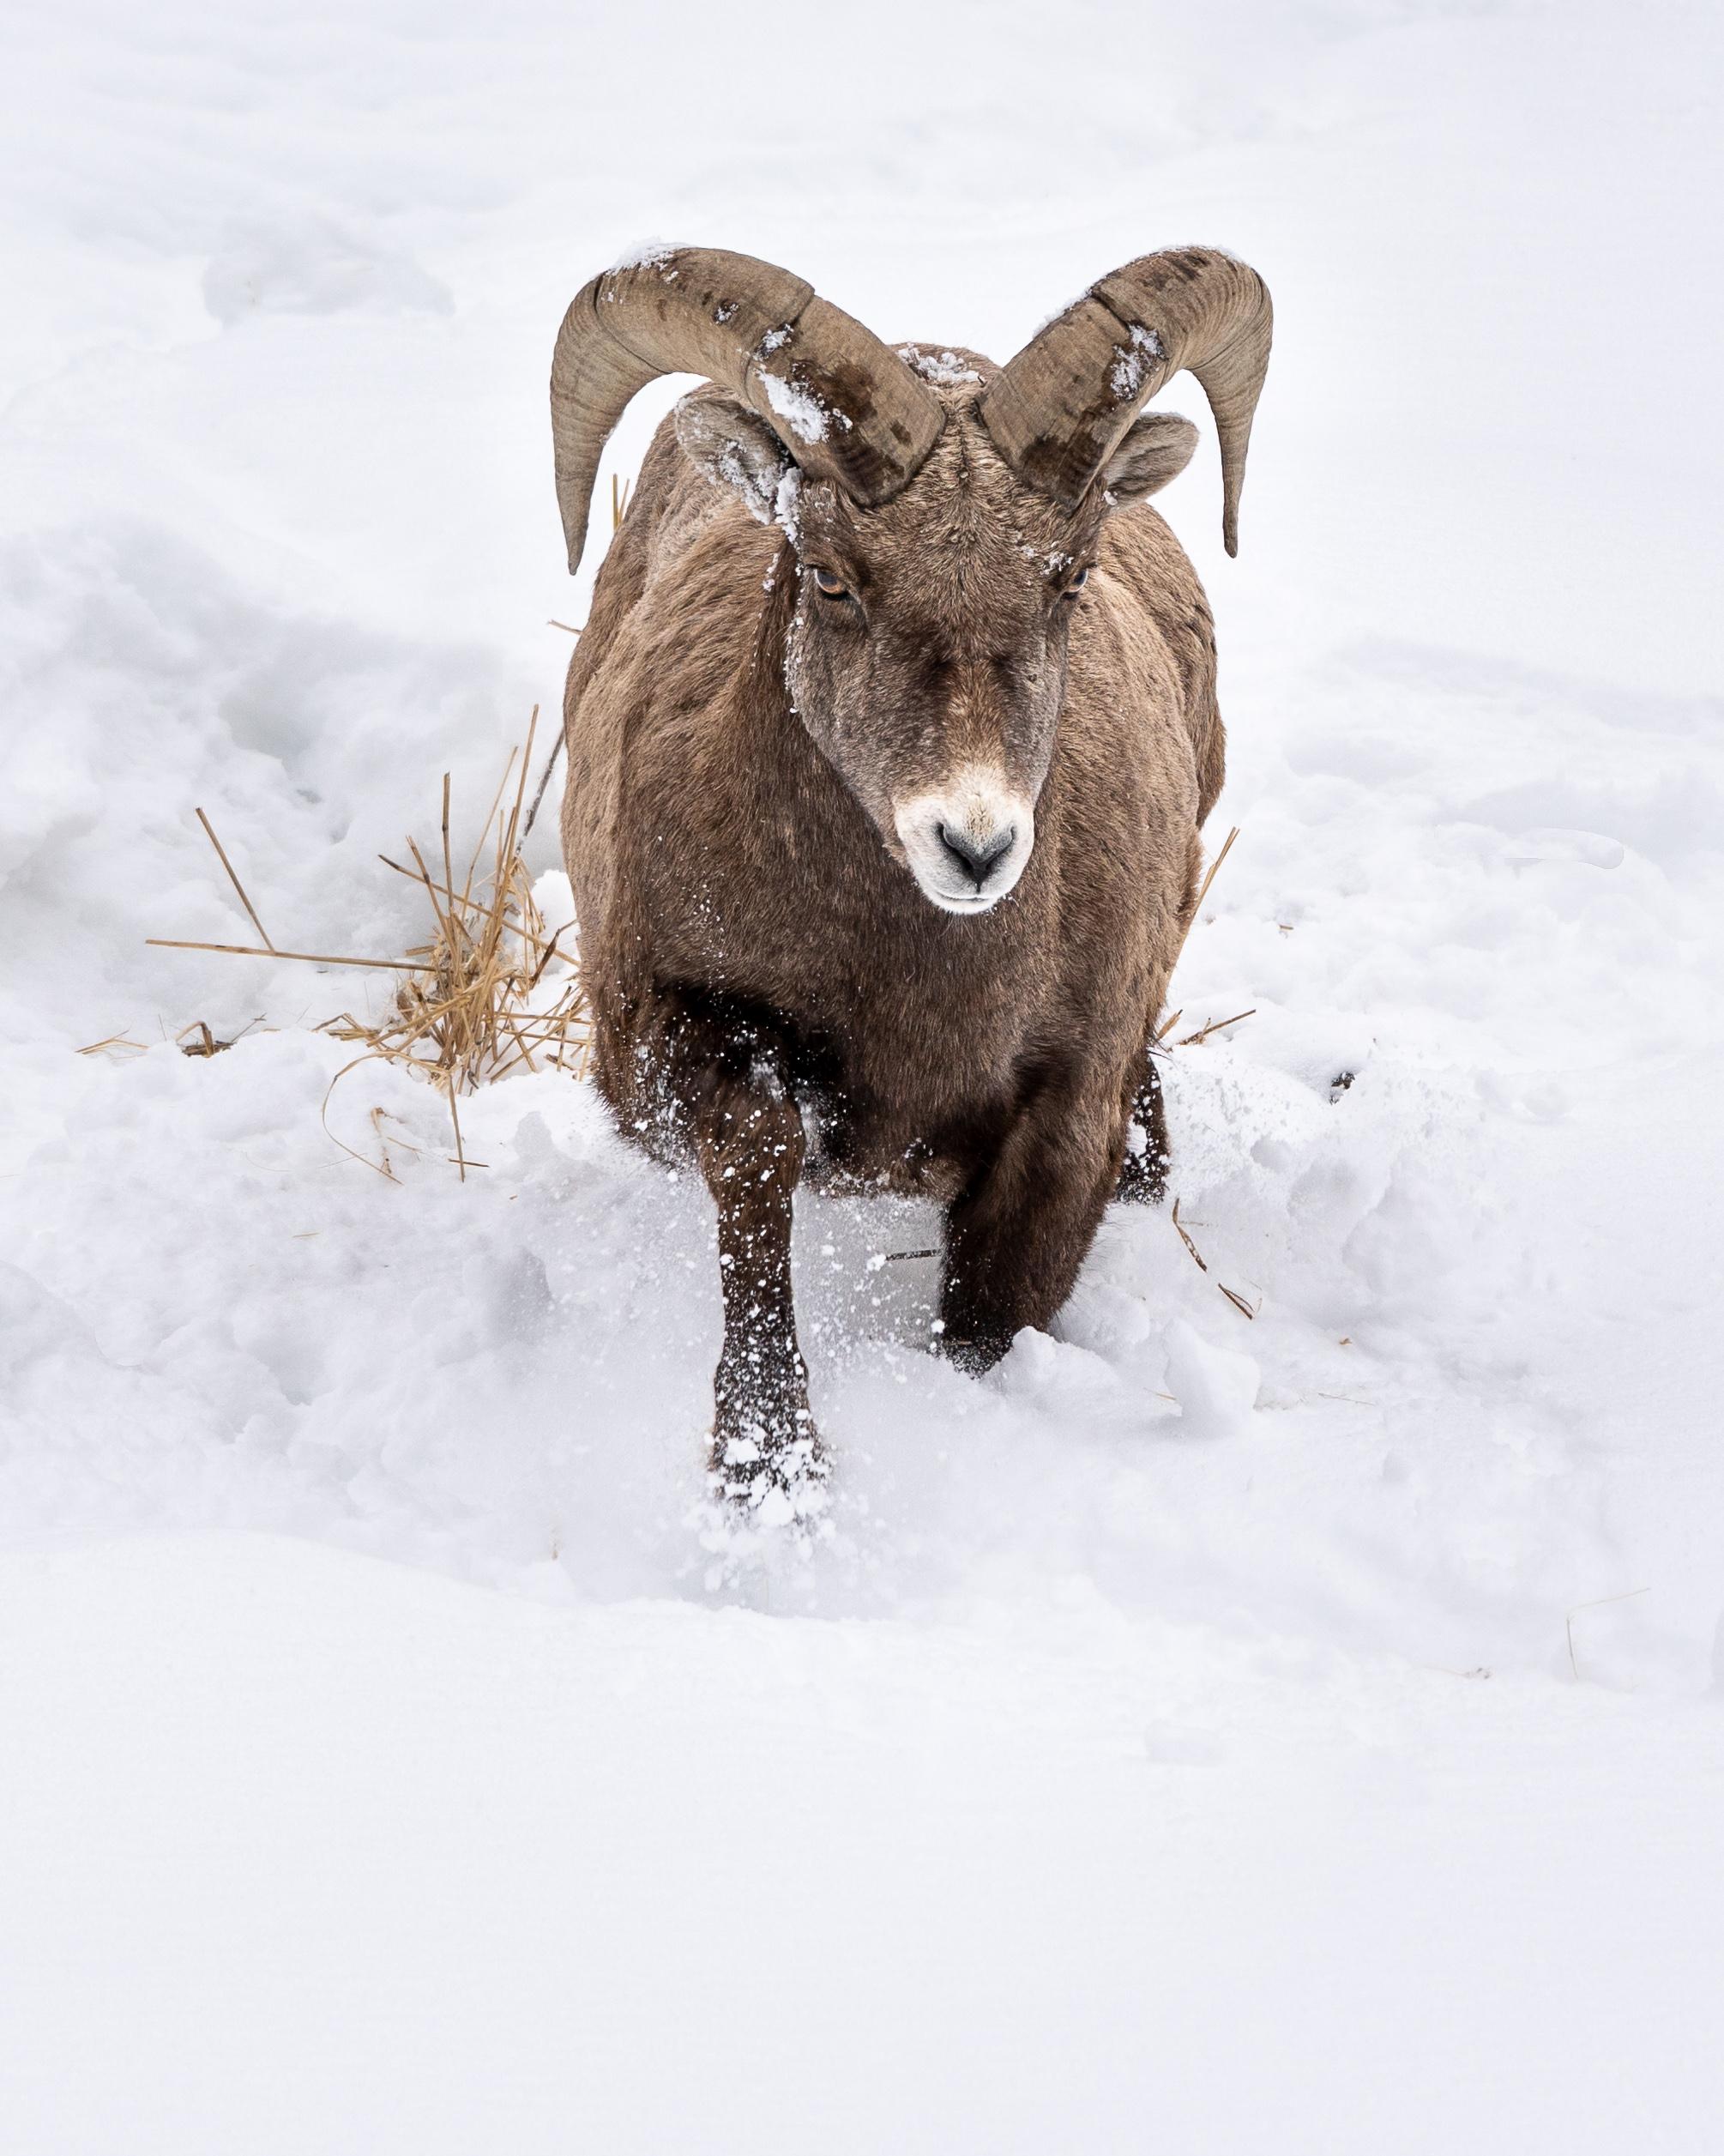 20190301_YellowstoneMckay_T_A08071-Edit.jpg